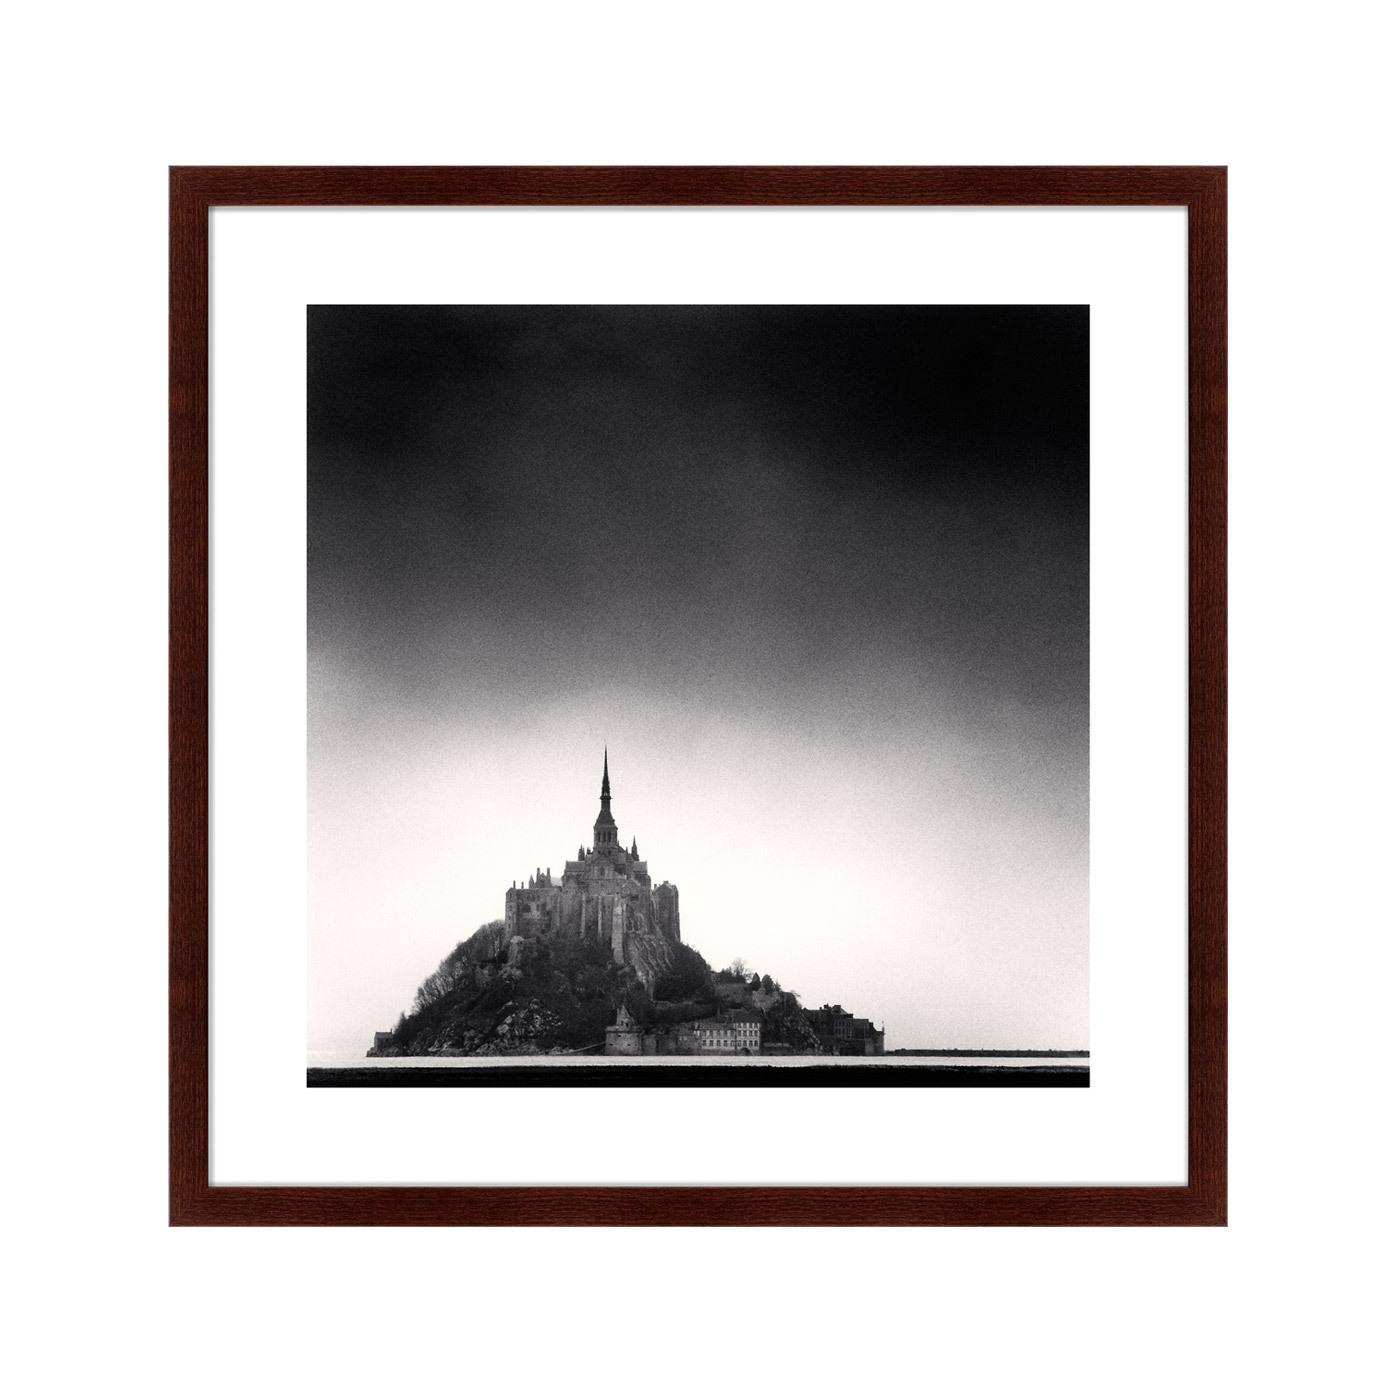 {} Картины в Квартиру Картина Castle (79х79 см) картины в квартиру картина слон 79х100 см